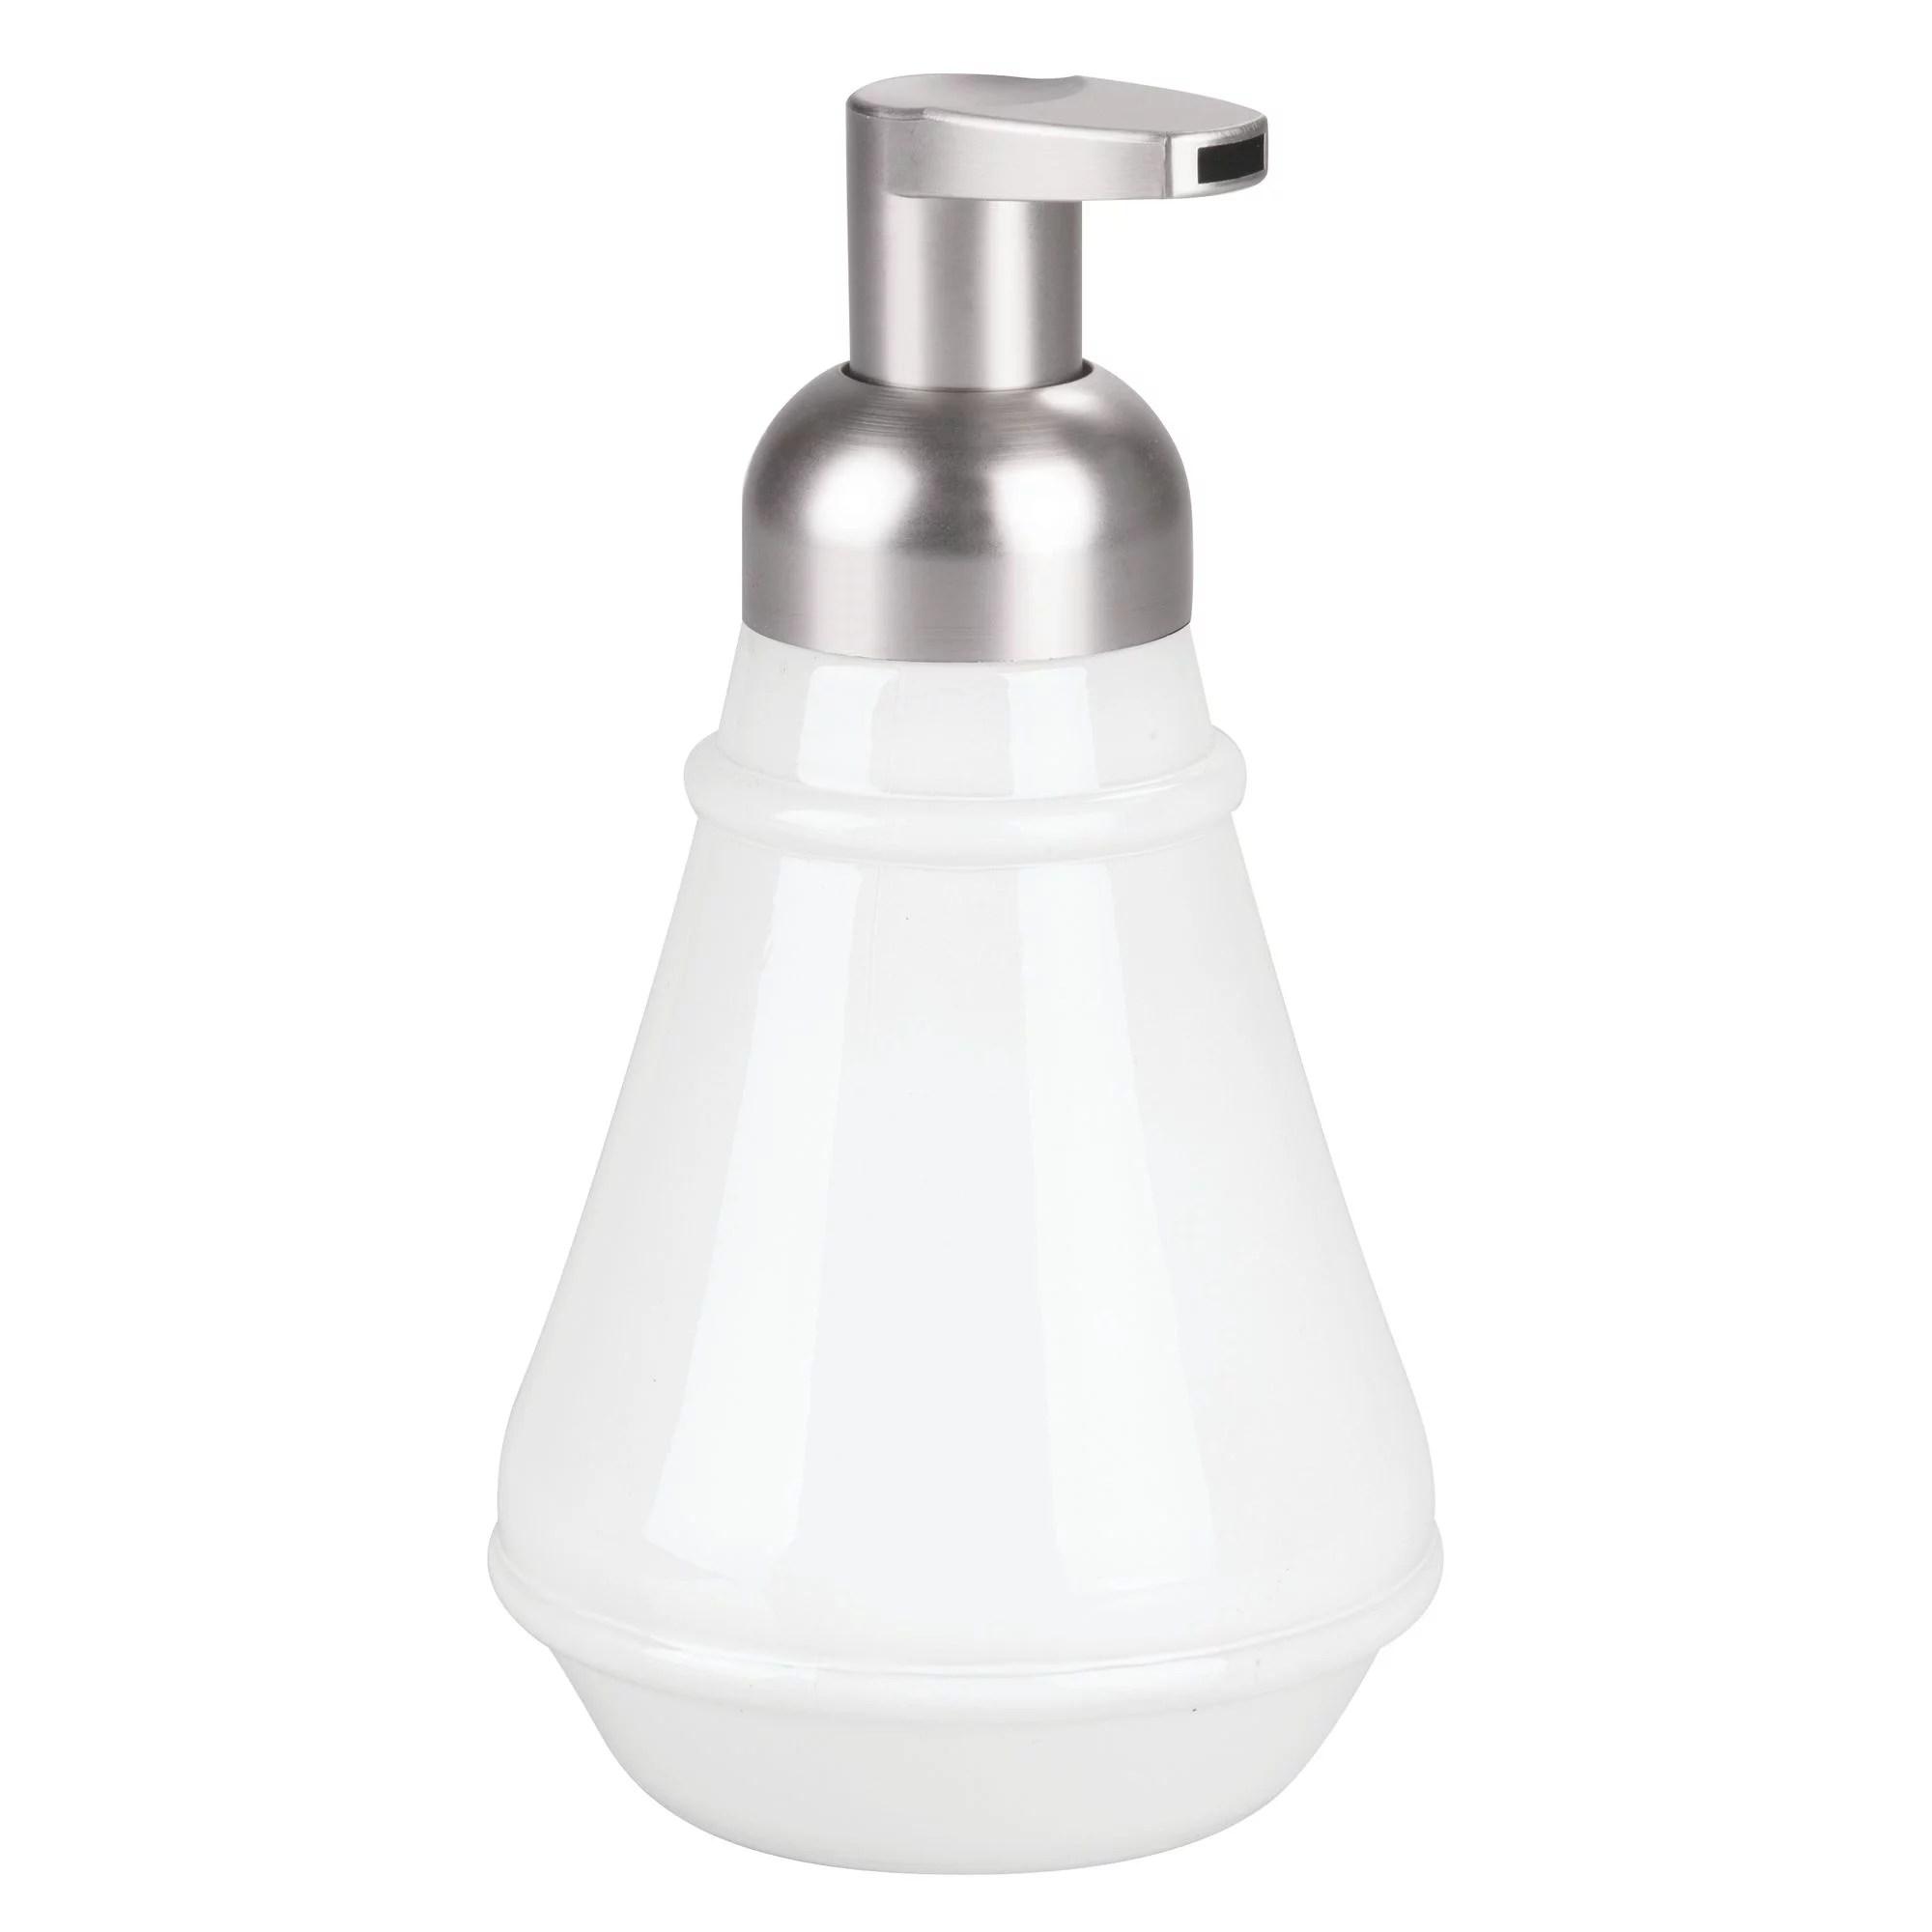 Better Homes and Gardens Foaming Soap Dispenser Pump for